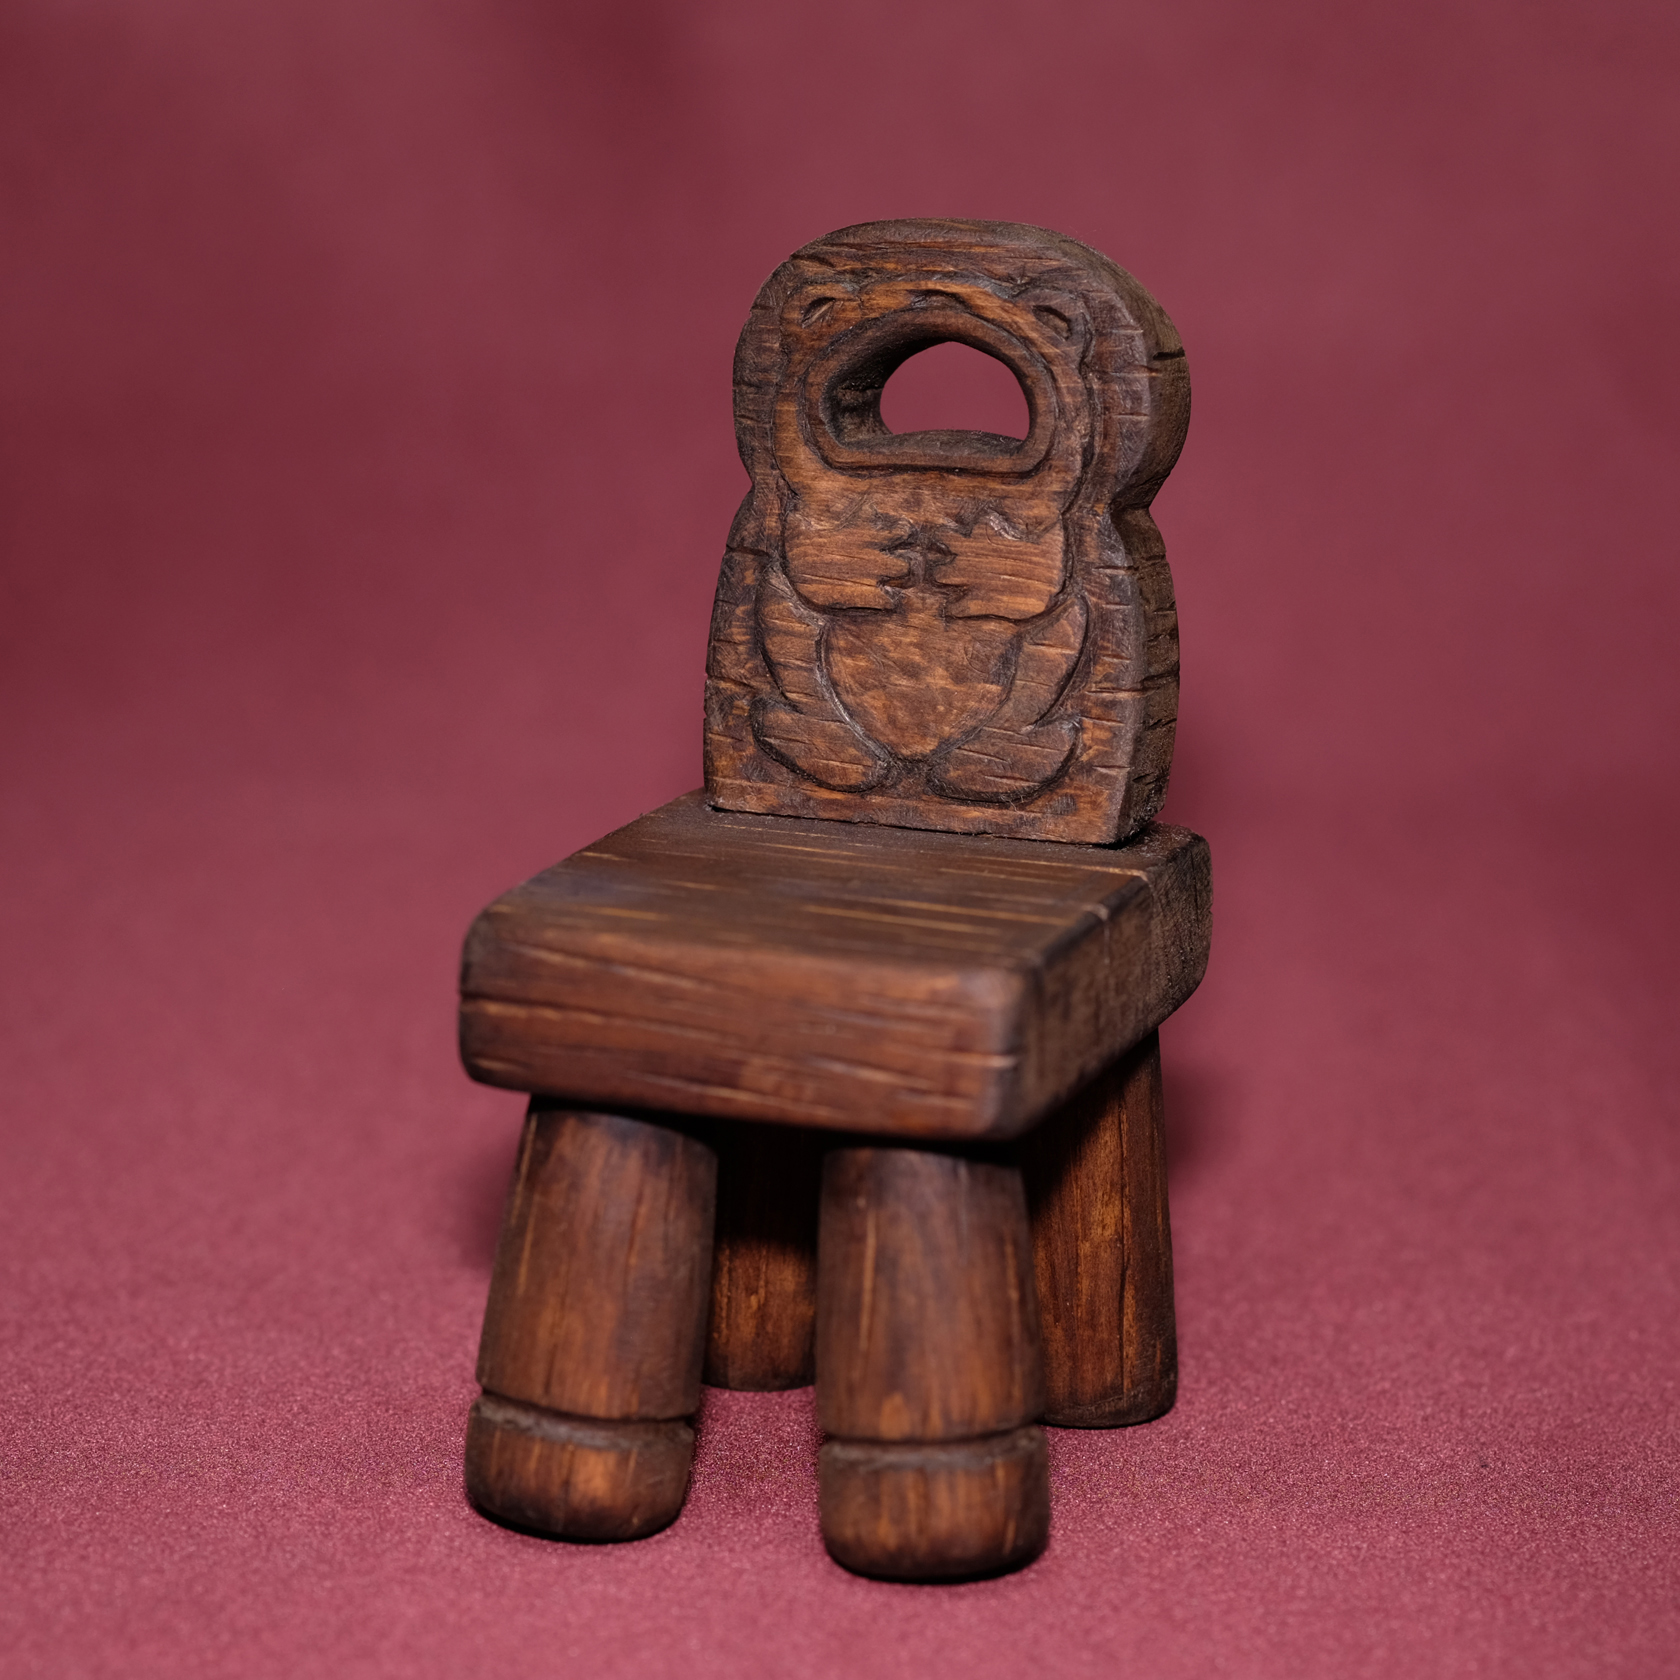 dwarfs_chair